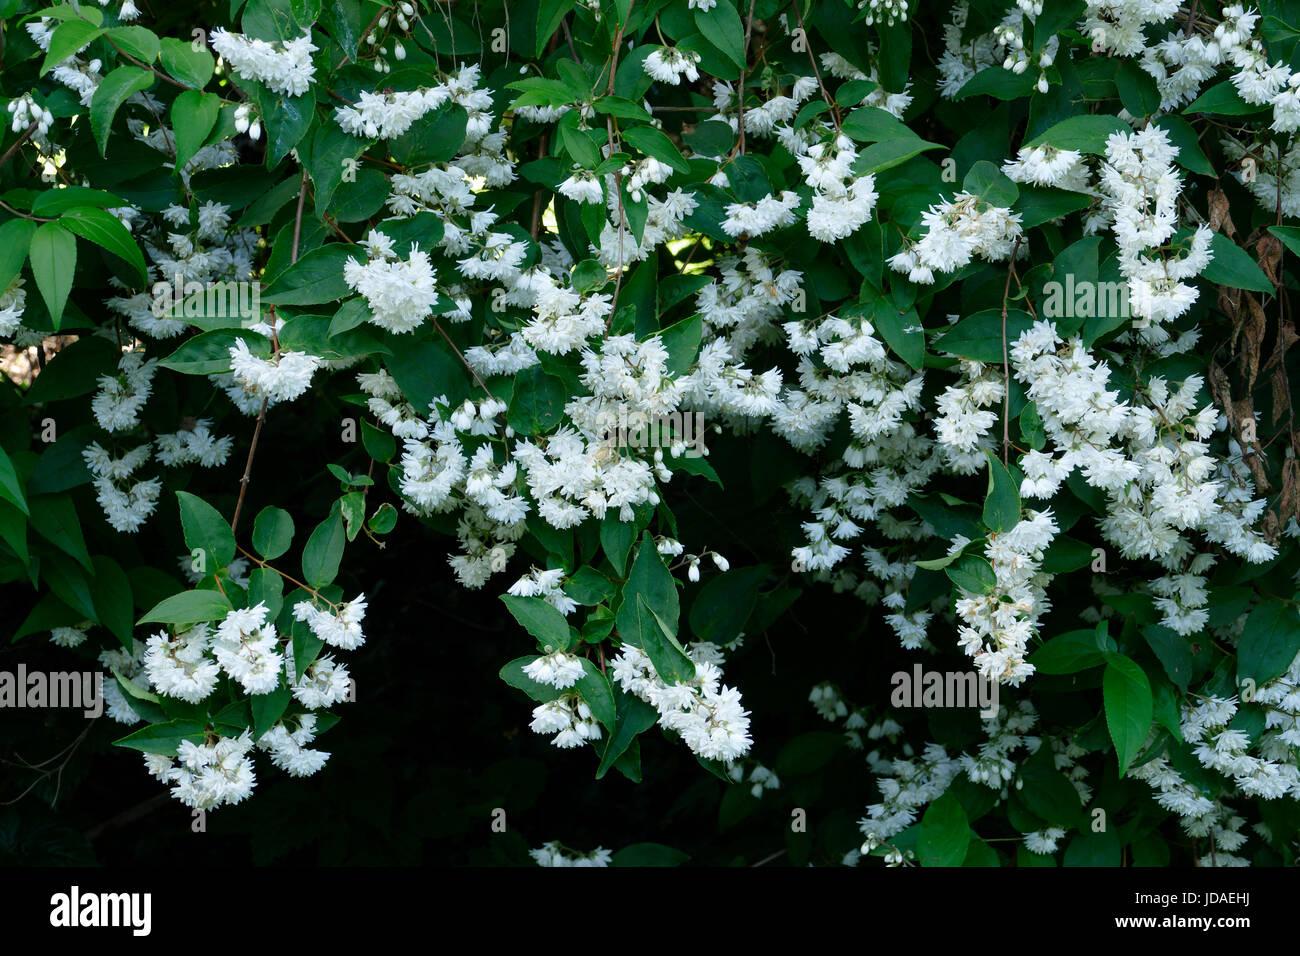 Deutzia scabra Plena in bloom in a garden. Suzanne's vegetable garden; Le Pas; Mayenne; France.; - Stock Image